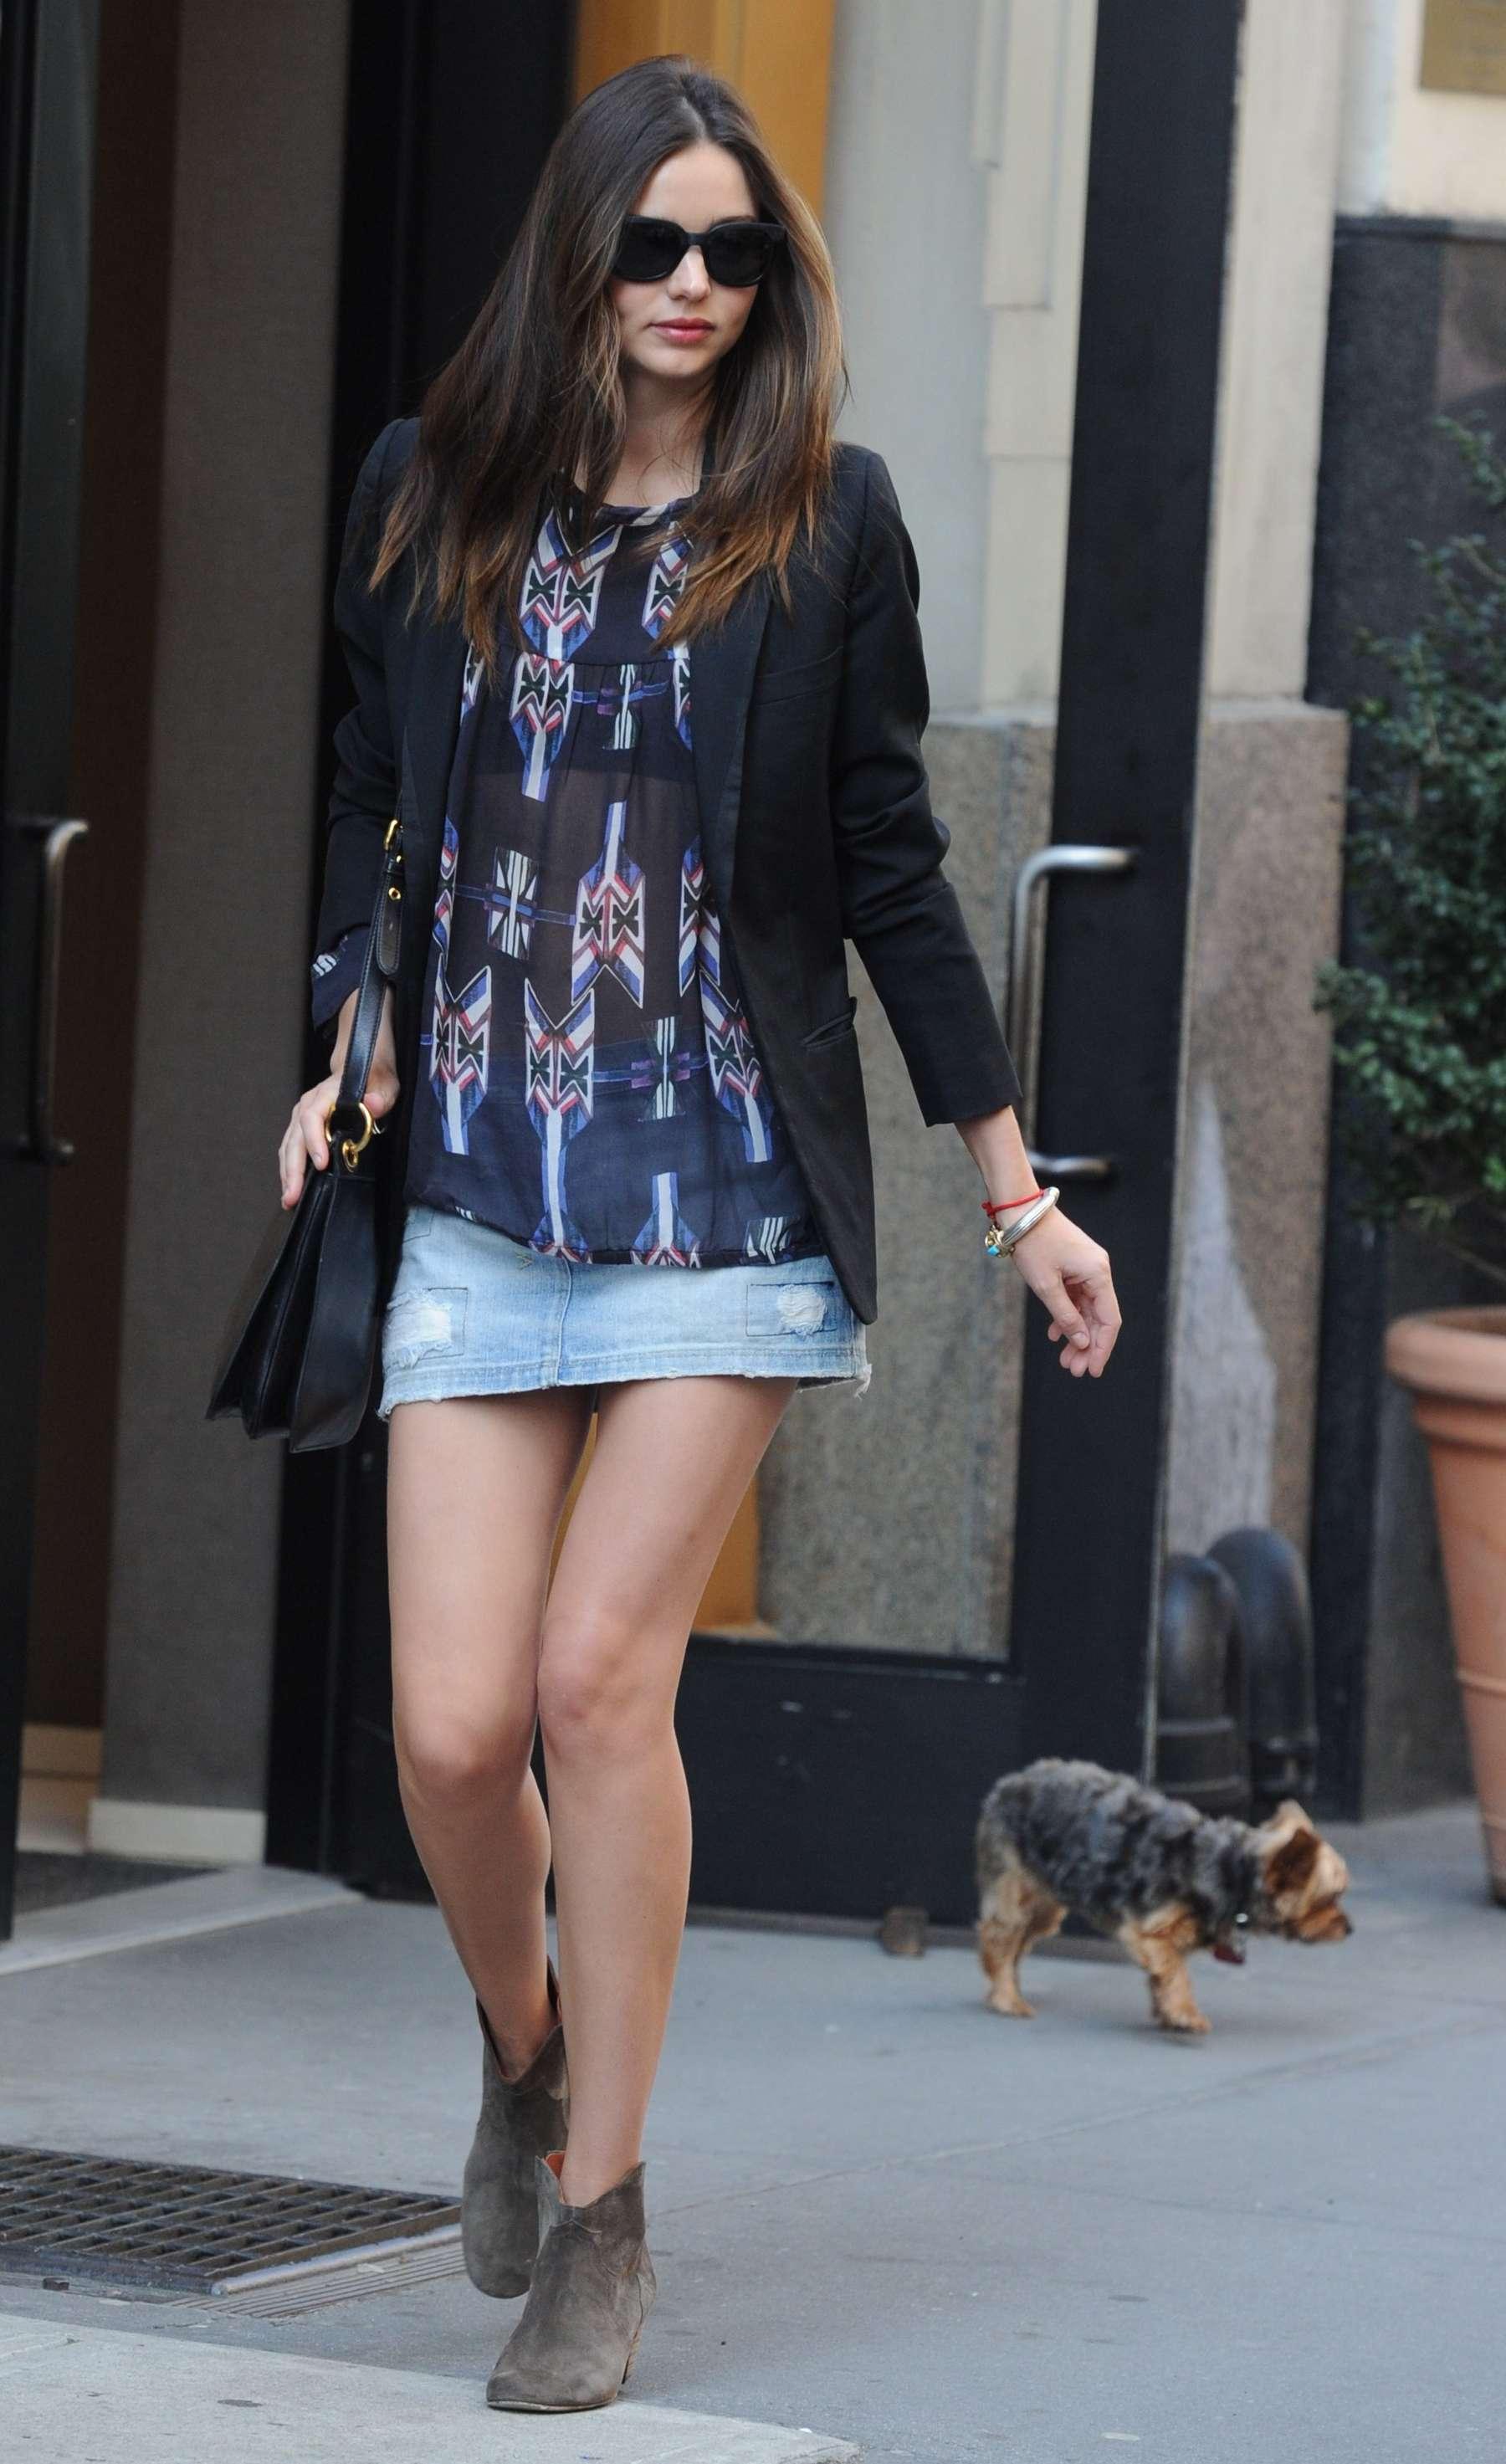 Miranda Kerr Legs in NY-06 - GotCeleb Malin Akerman